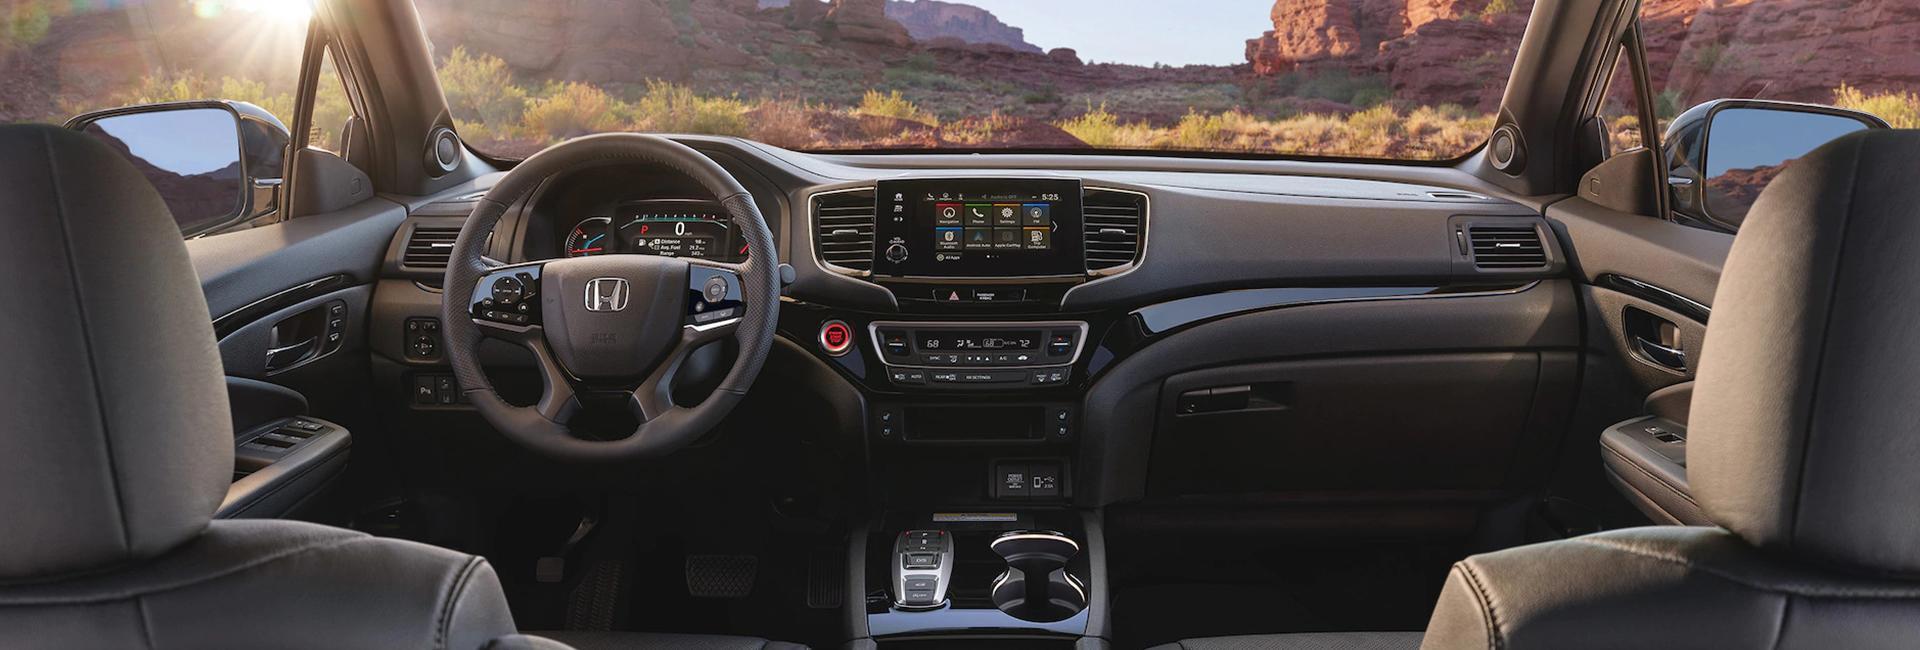 Rear-seat perspective of a Honda Passport's interior